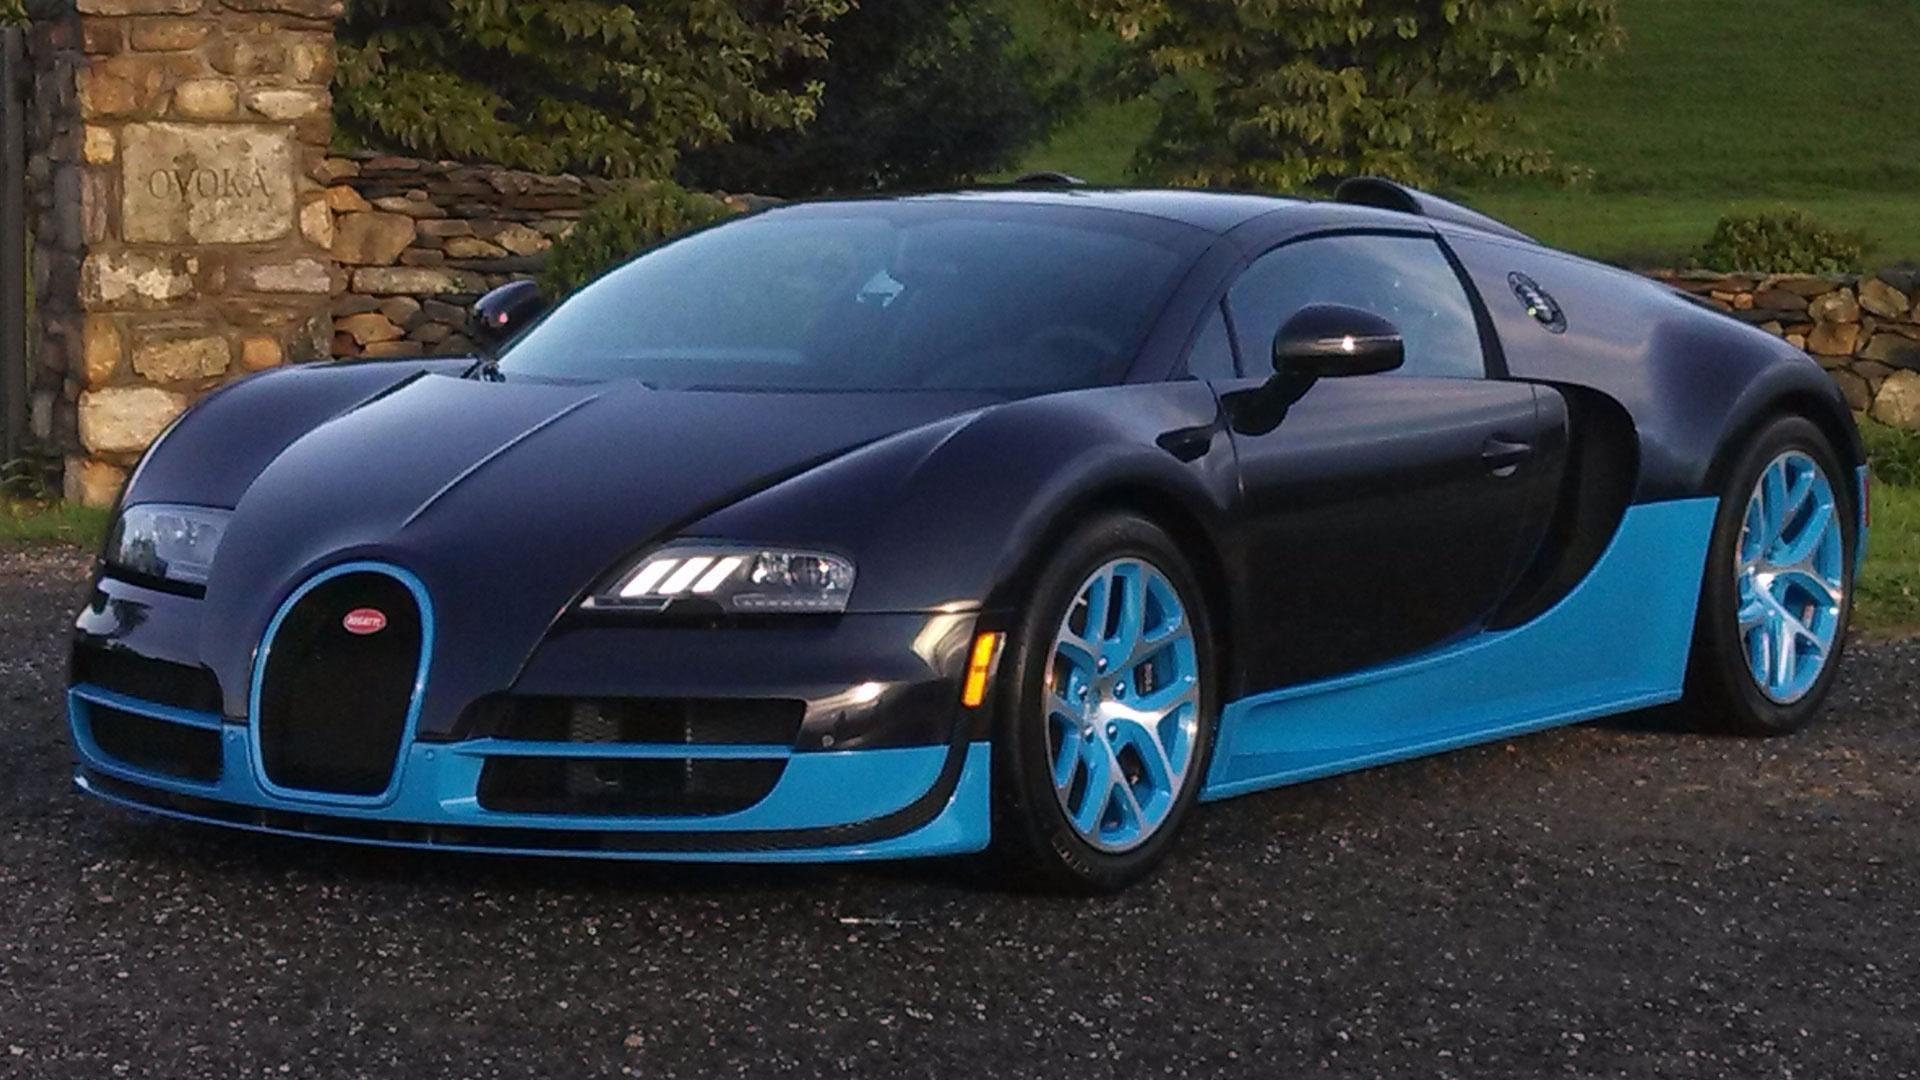 motorweek 2013 bugatti veyron grand sport vitesse 2013. Black Bedroom Furniture Sets. Home Design Ideas